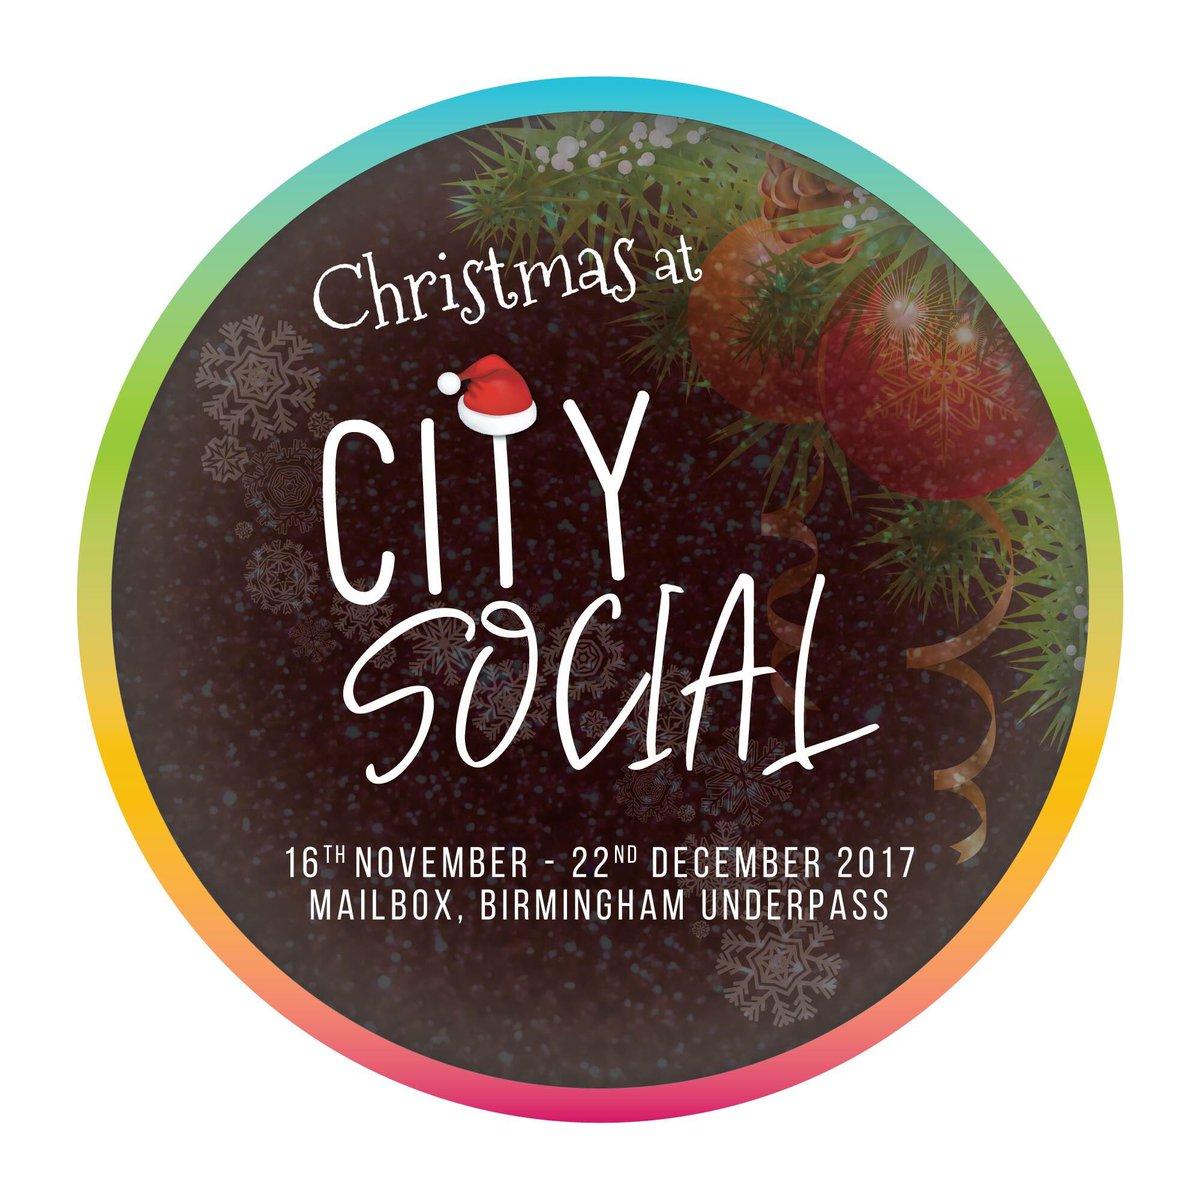 Can&#39;t wait for this  Christmas at city social #christmas #birmingham #everyday #food #drink #entertainment #retail @CitySocialBham<br>http://pic.twitter.com/Q6MFnCjAgJ